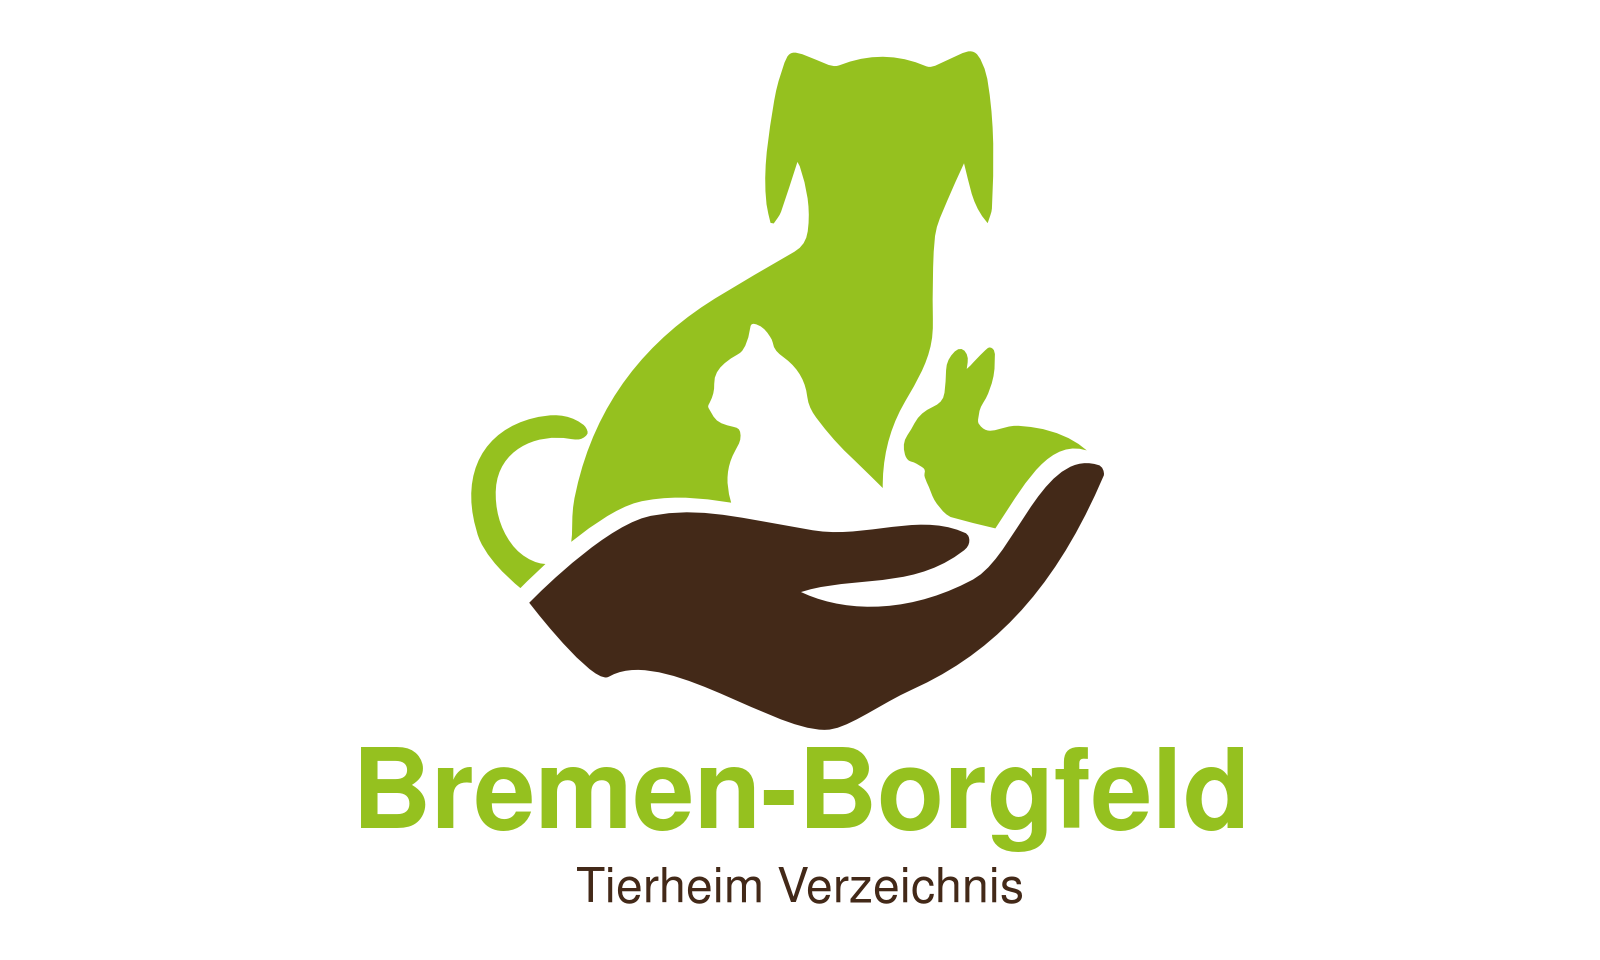 Tierheim Bremen Borgfeld